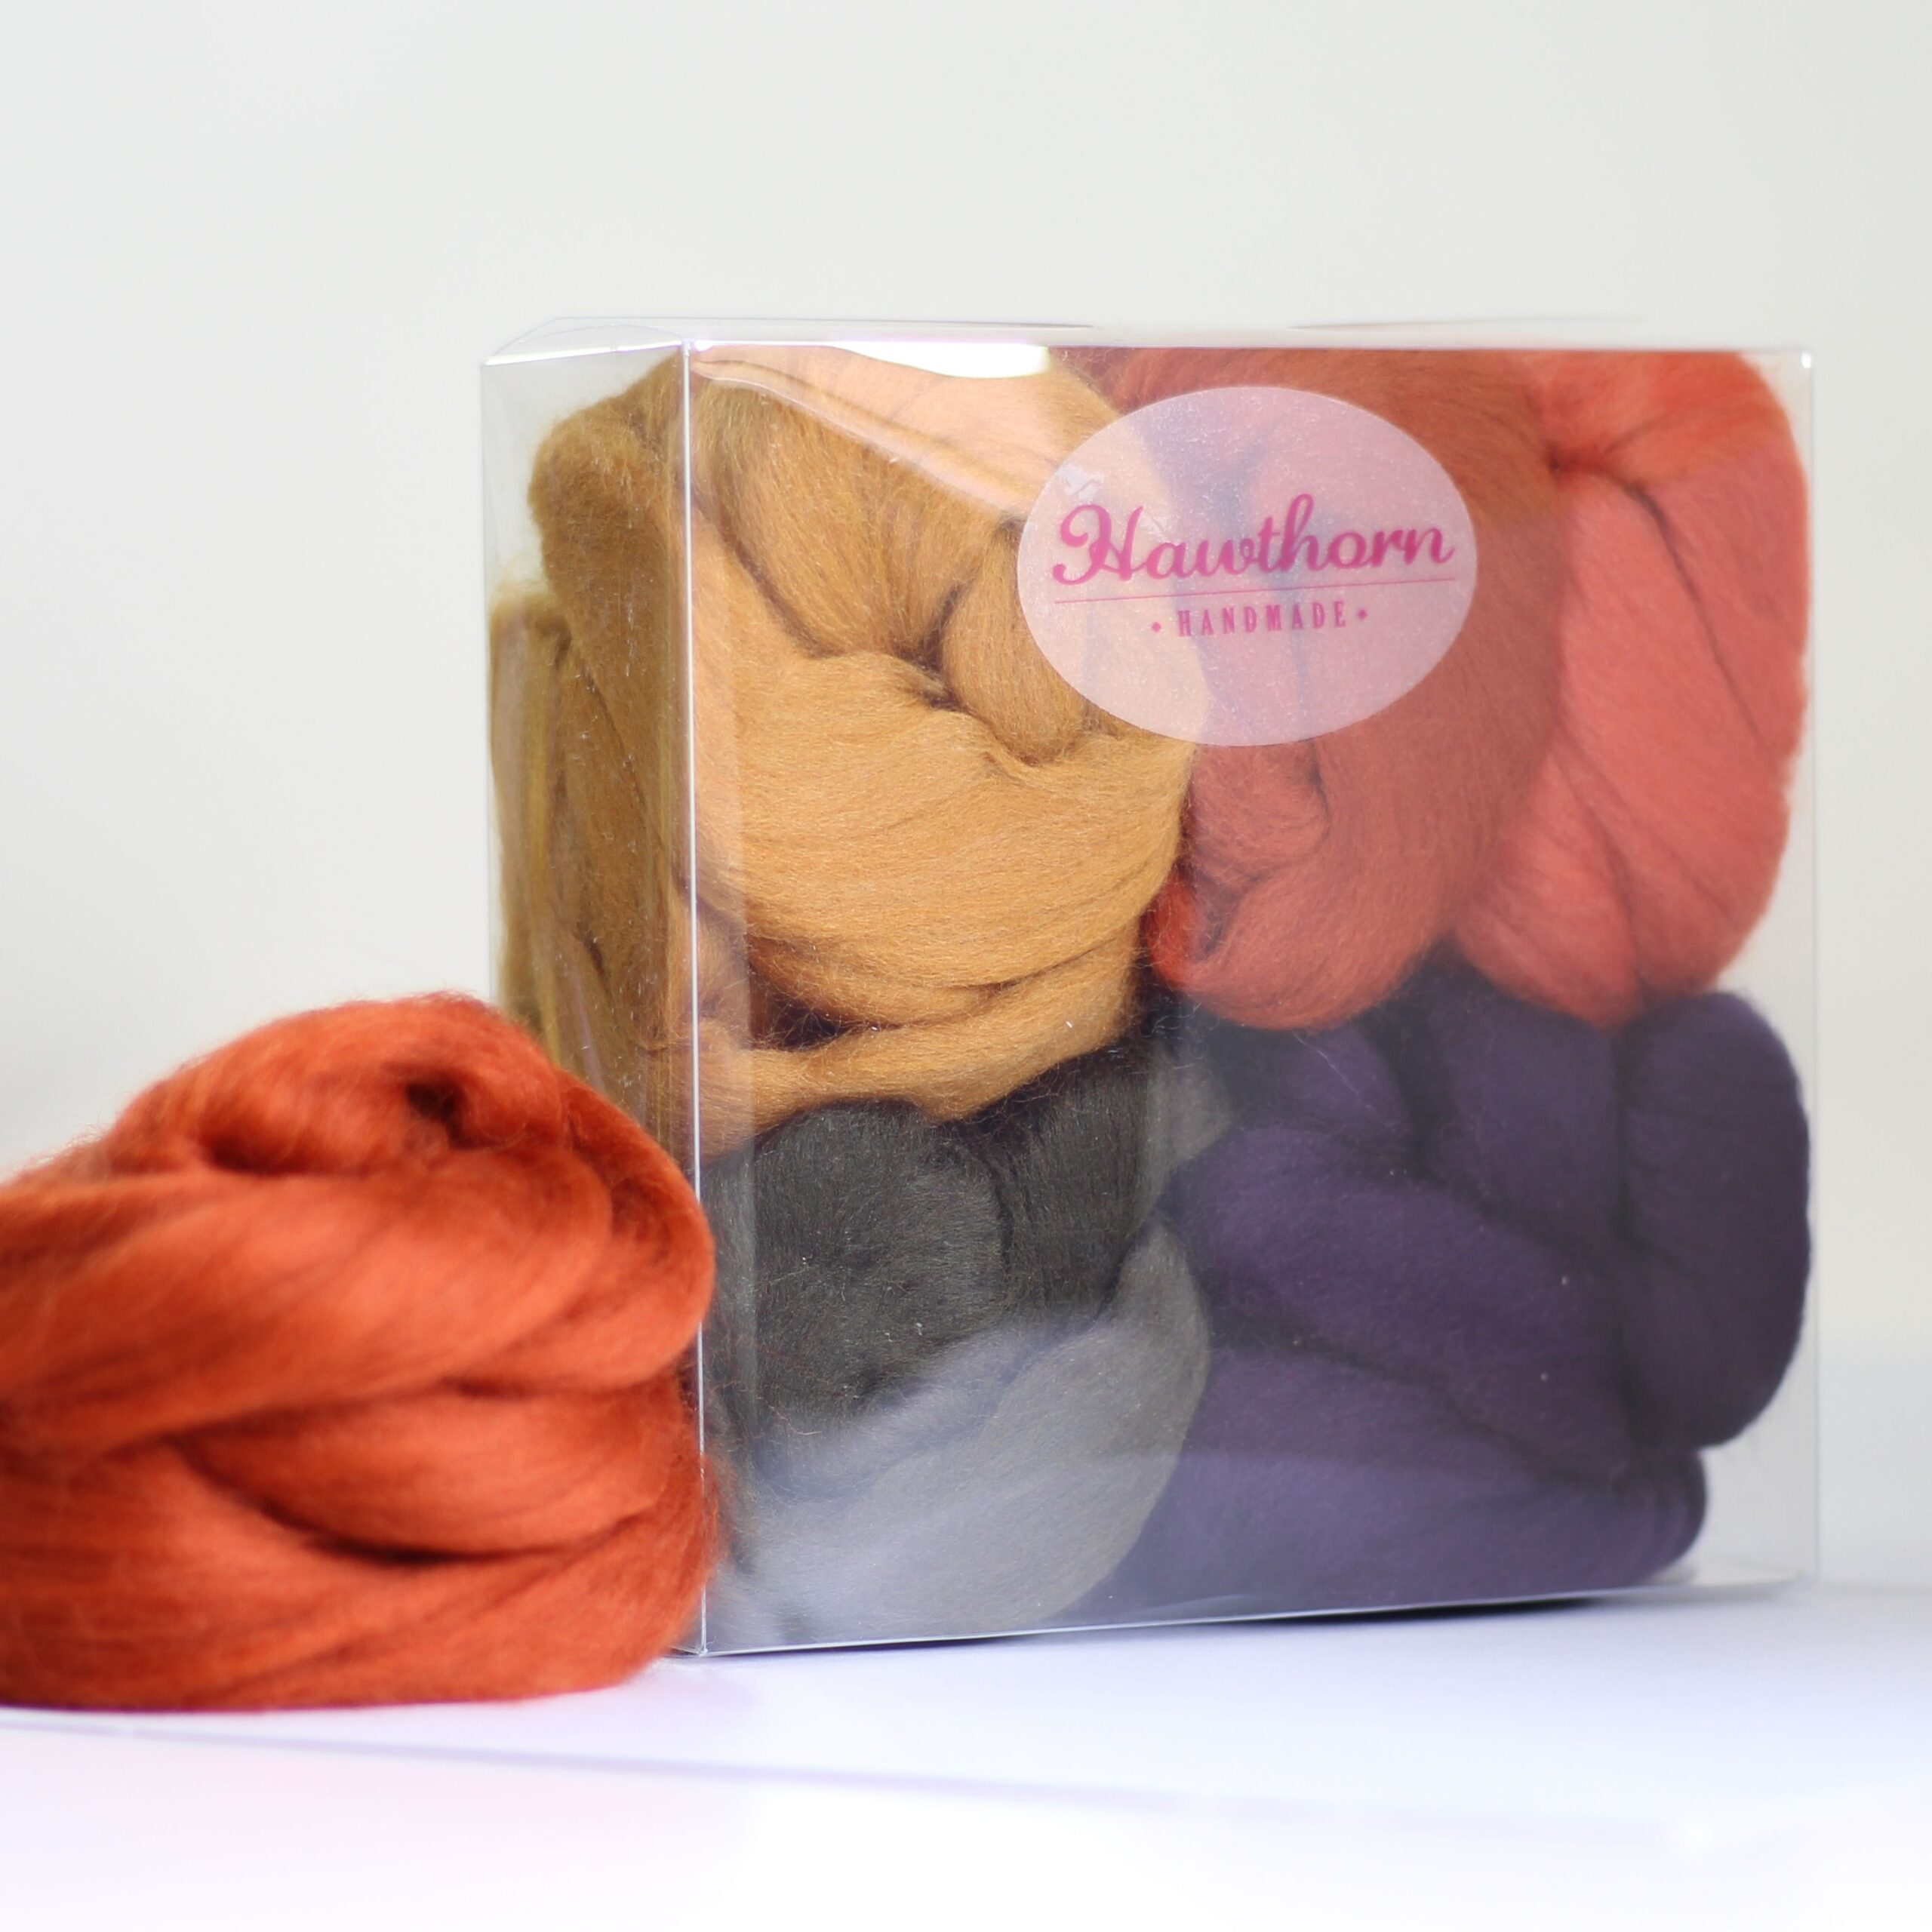 Hawthorn Handmade Merino Wool for needle felting